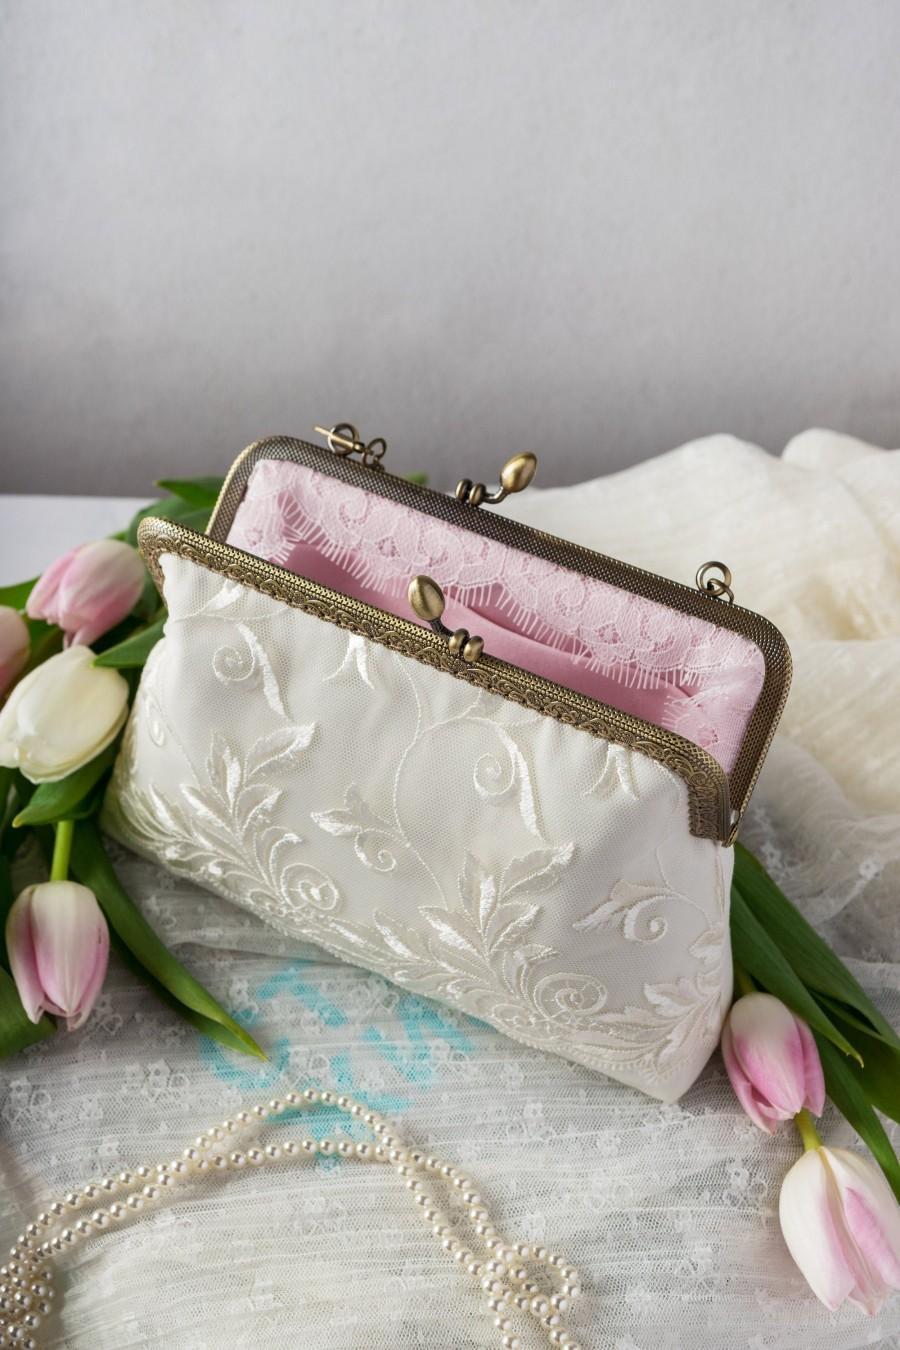 زفاف - Ivory lace wedding purse / Bridal clutch bag of cotton satin / Rustic wedding purse clutch / Ivory bride accessory